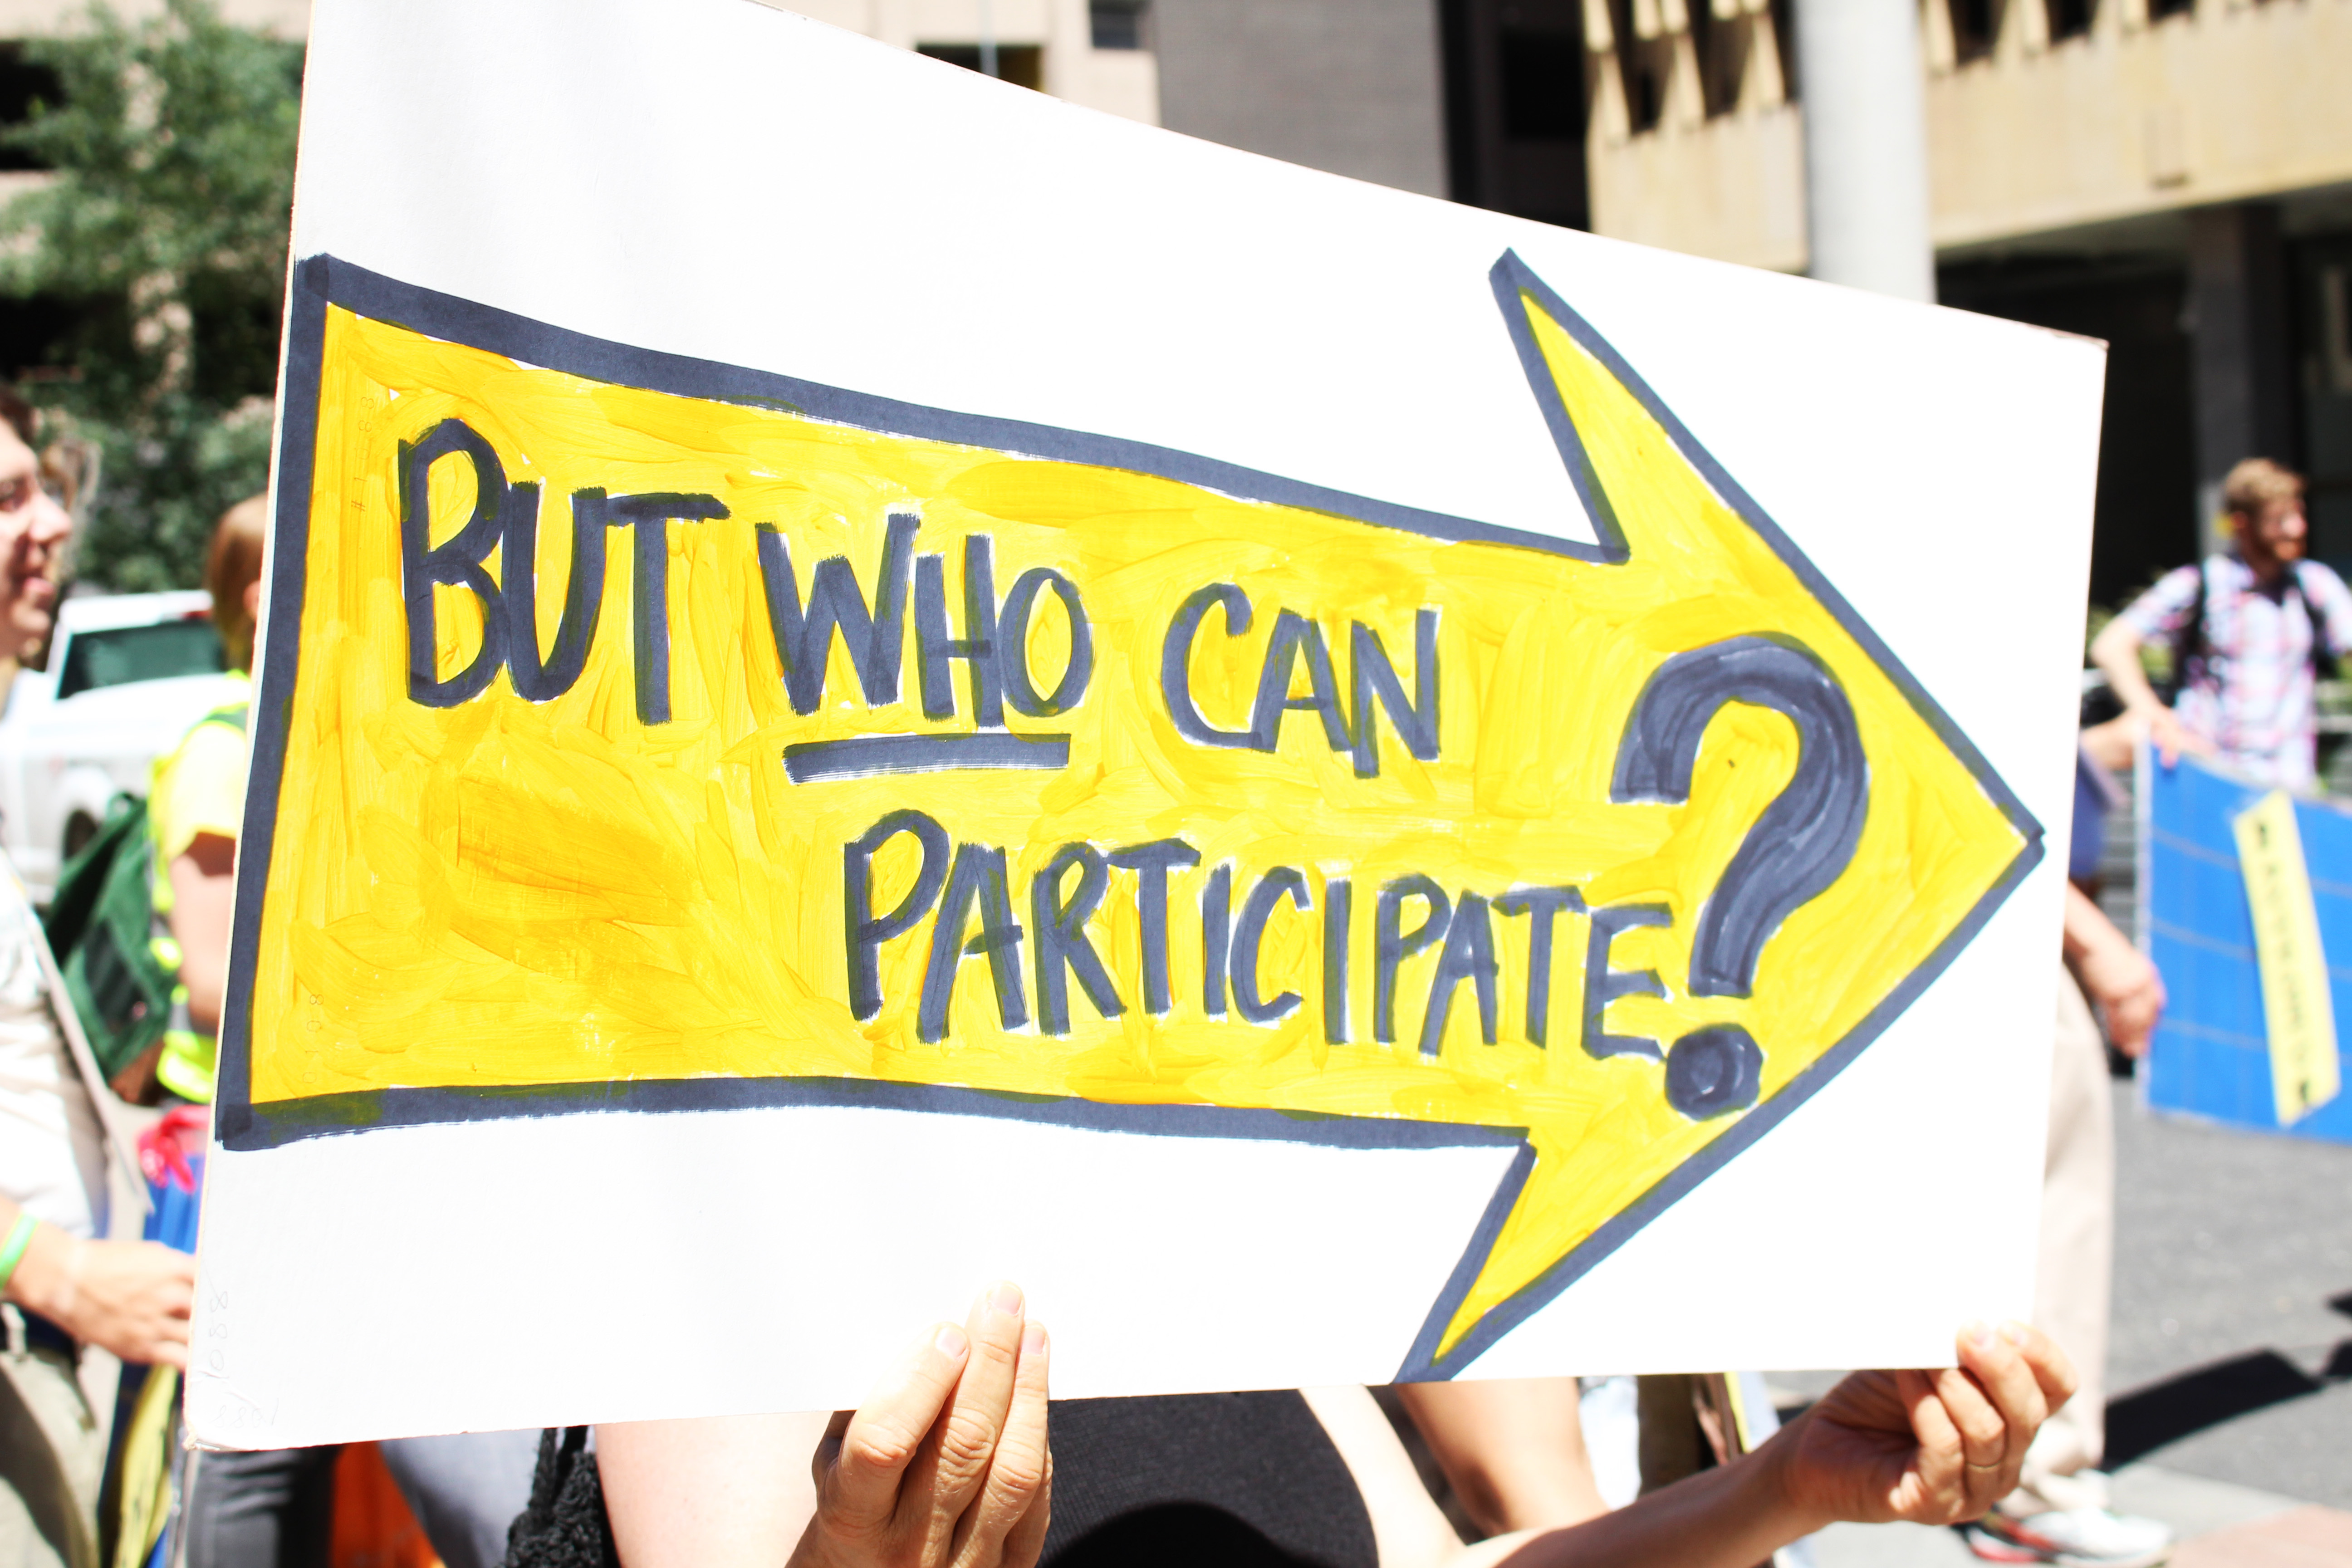 WhoCanParticipate.JPG